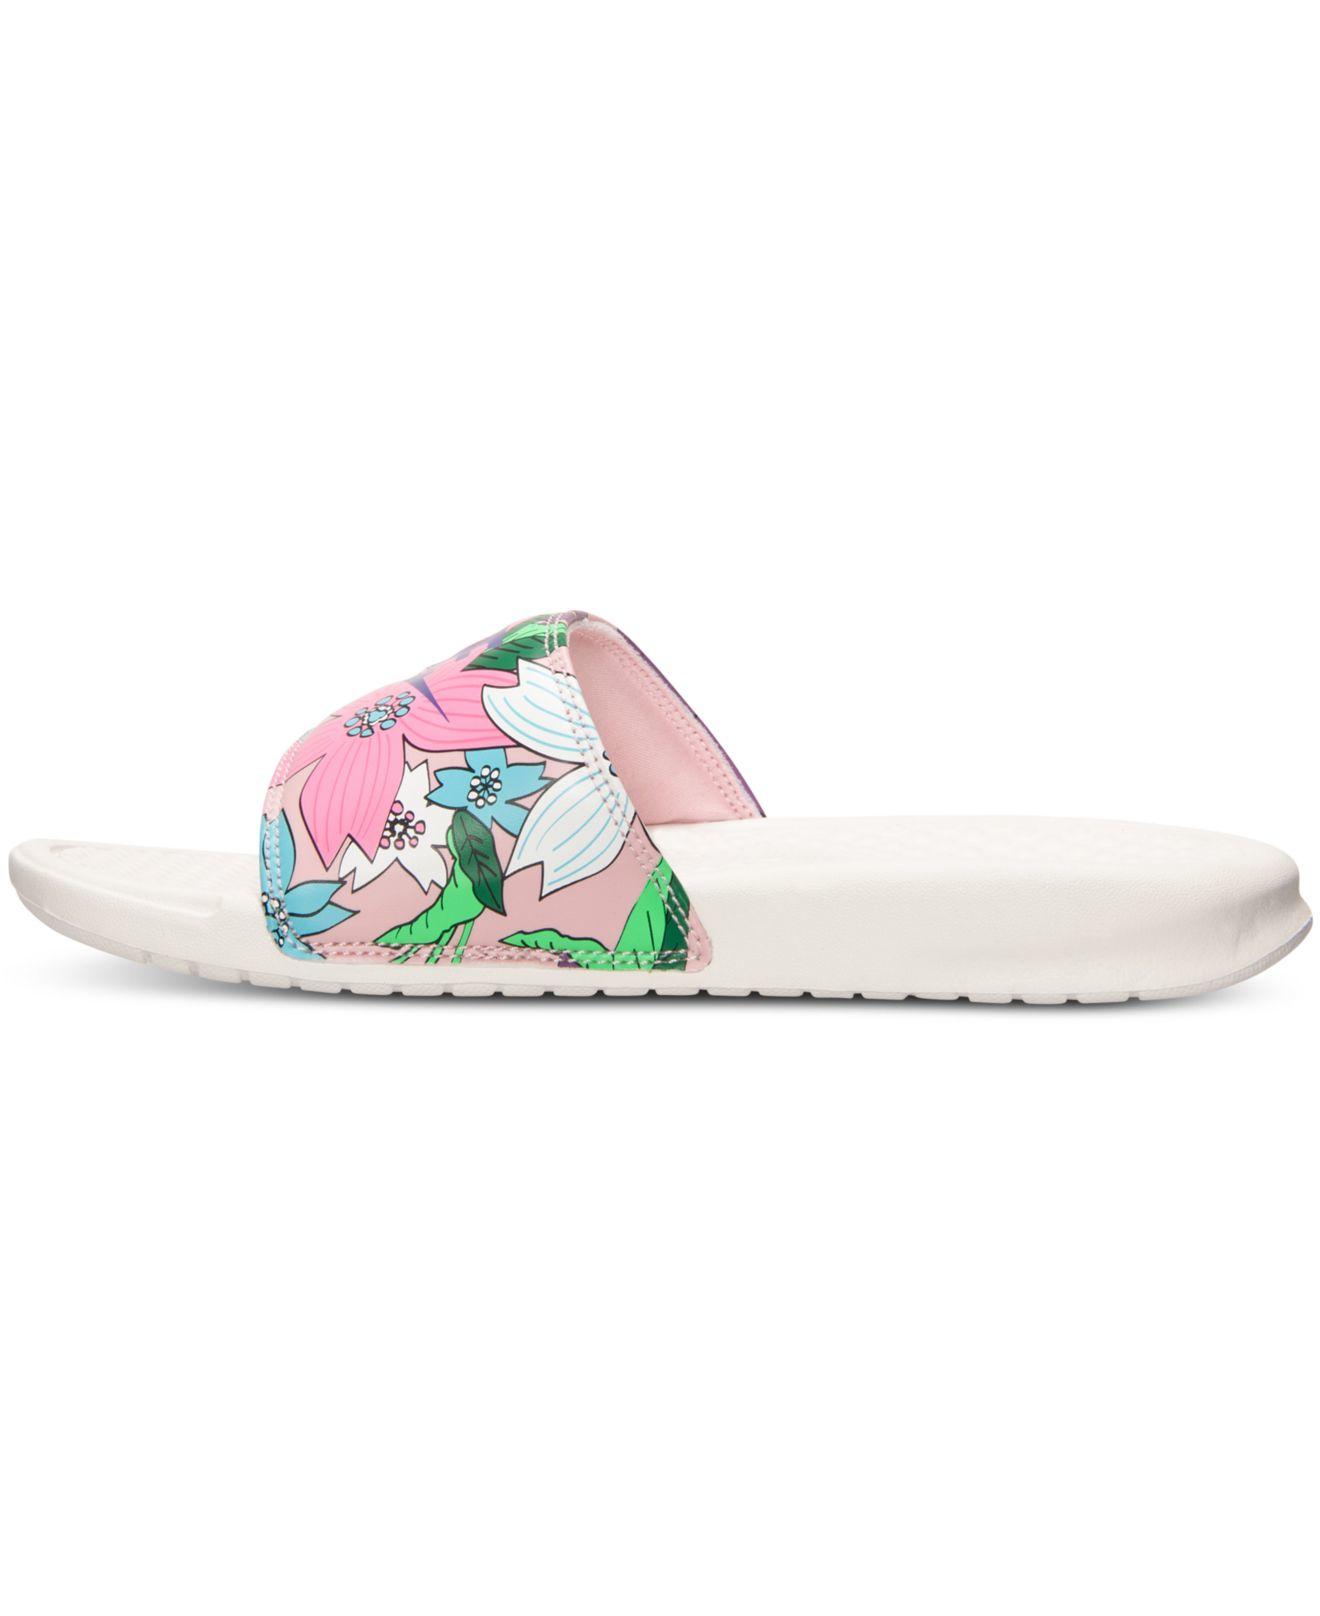 Unique Nike Sale  Nike Benassi JDI Slide Black Vivid Pink Women Shoes